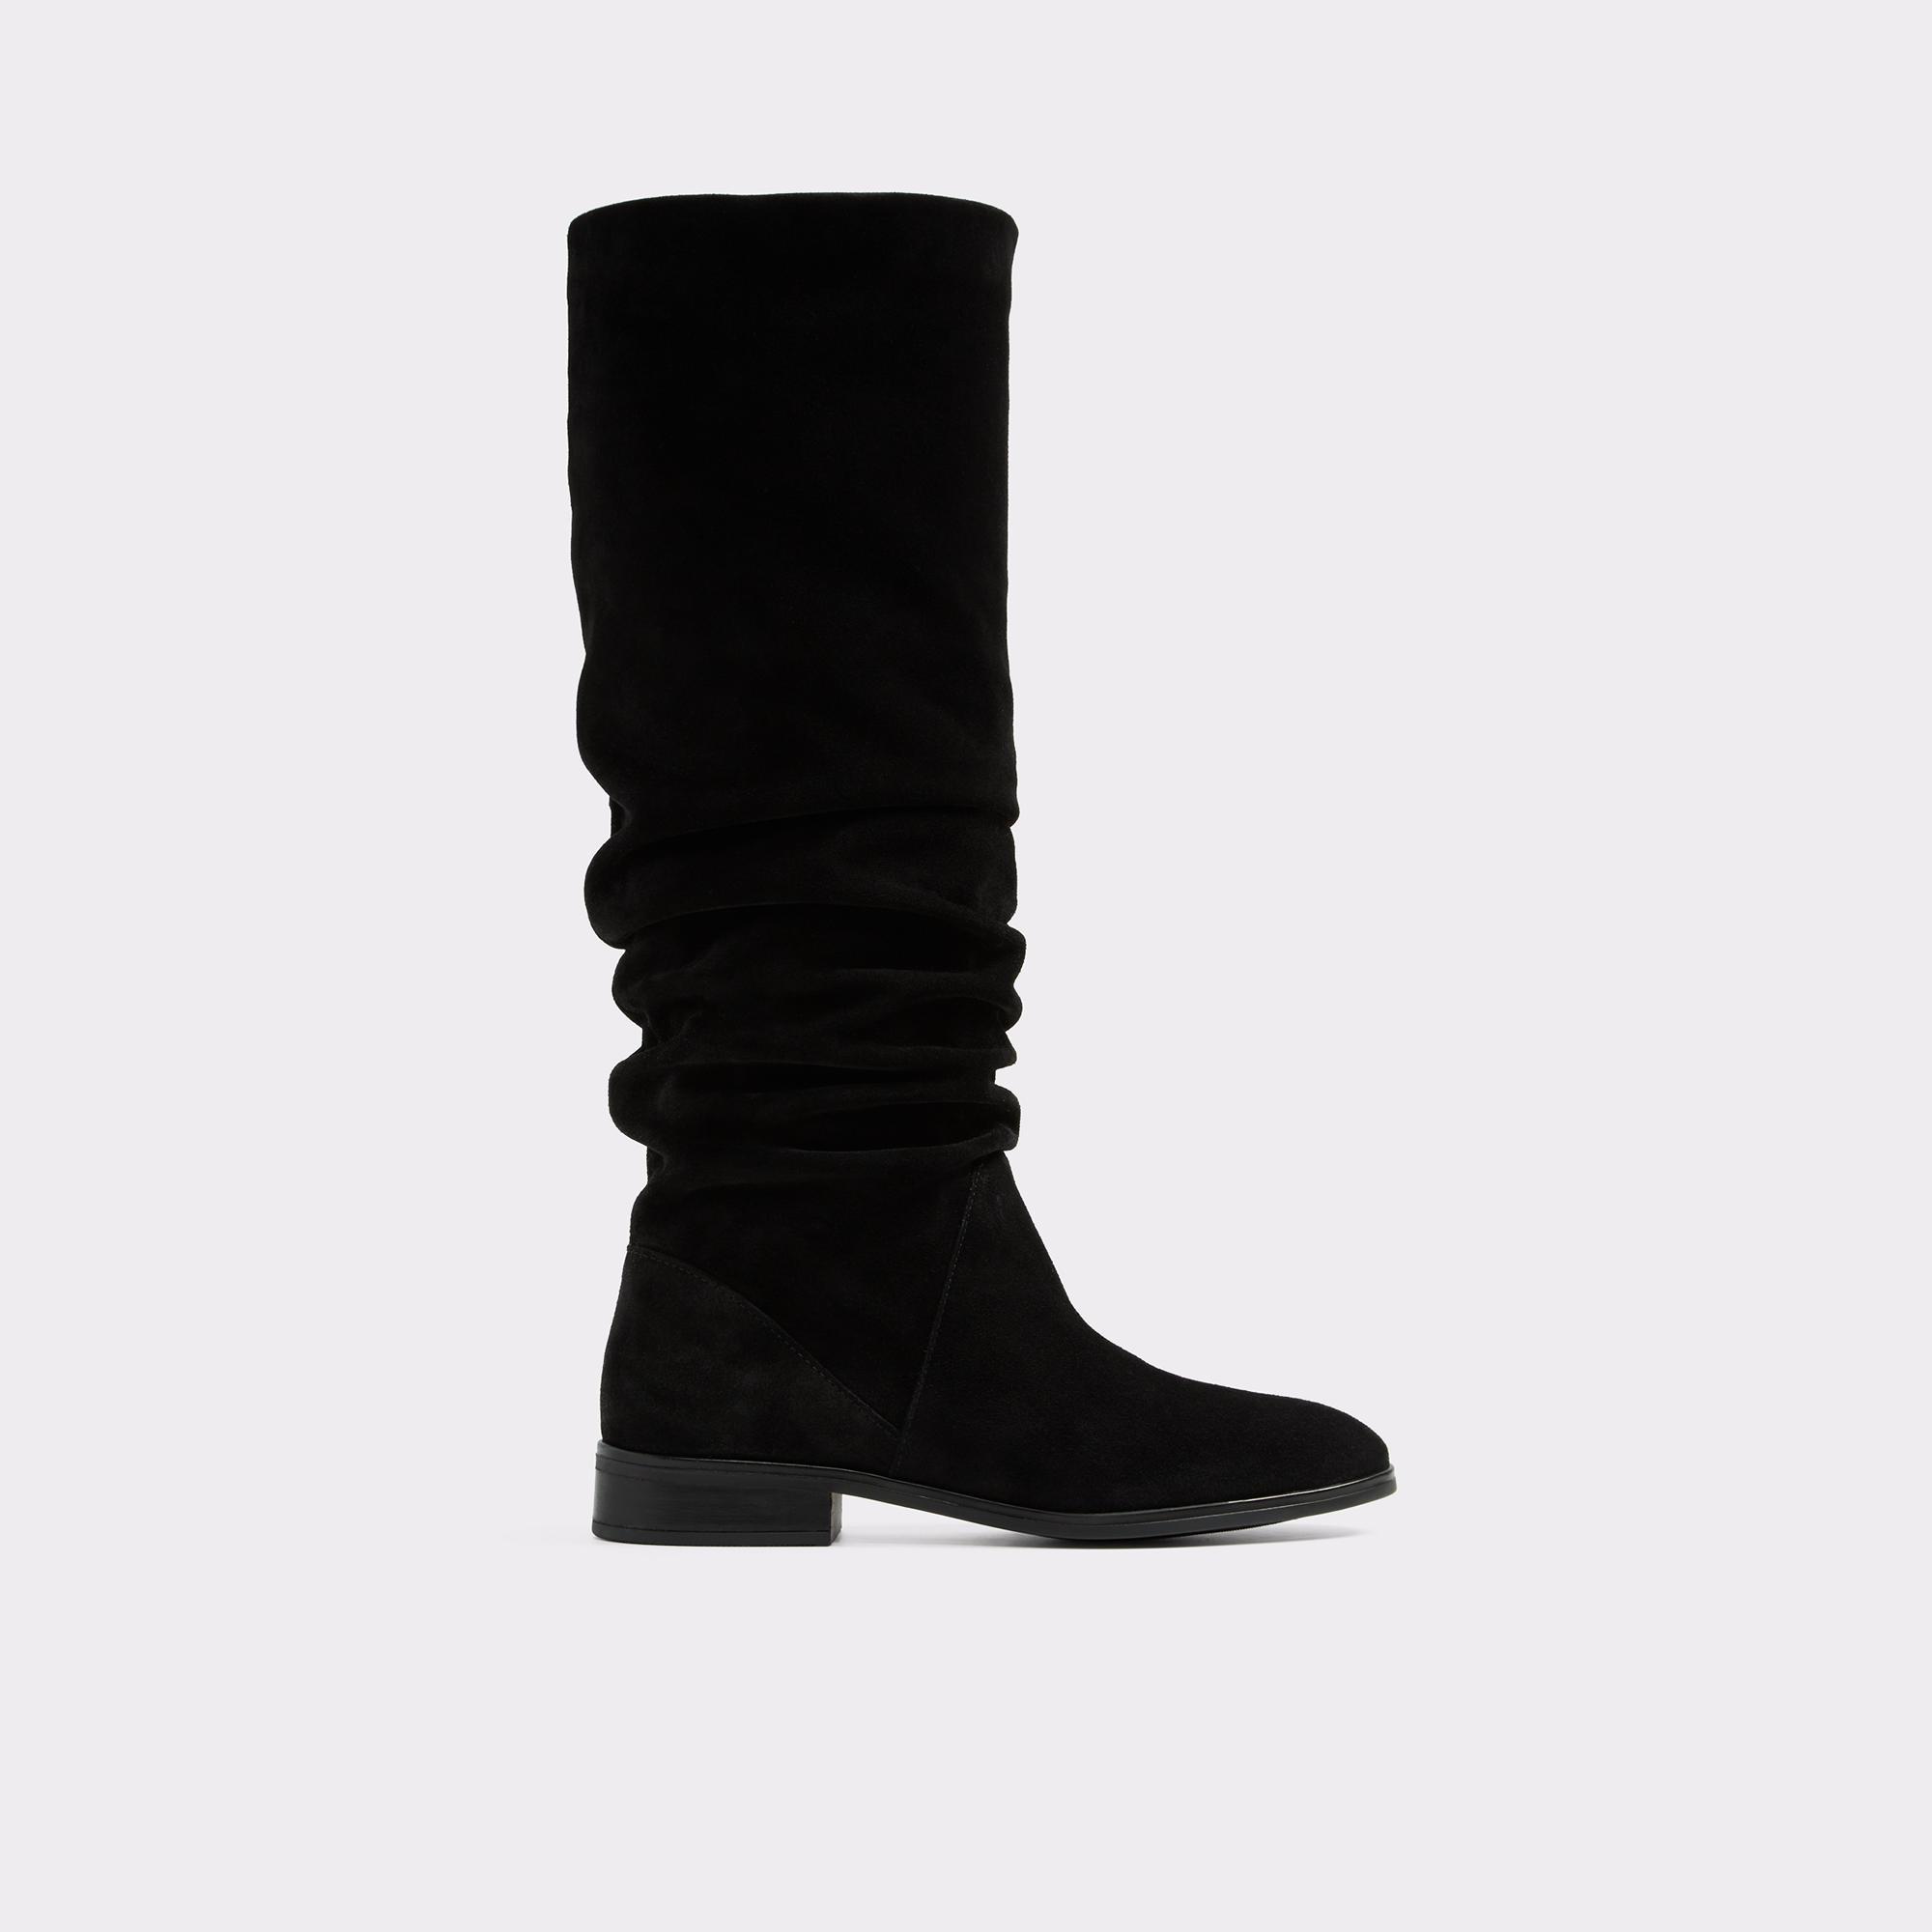 Aldo: Ligodda Boots - $200